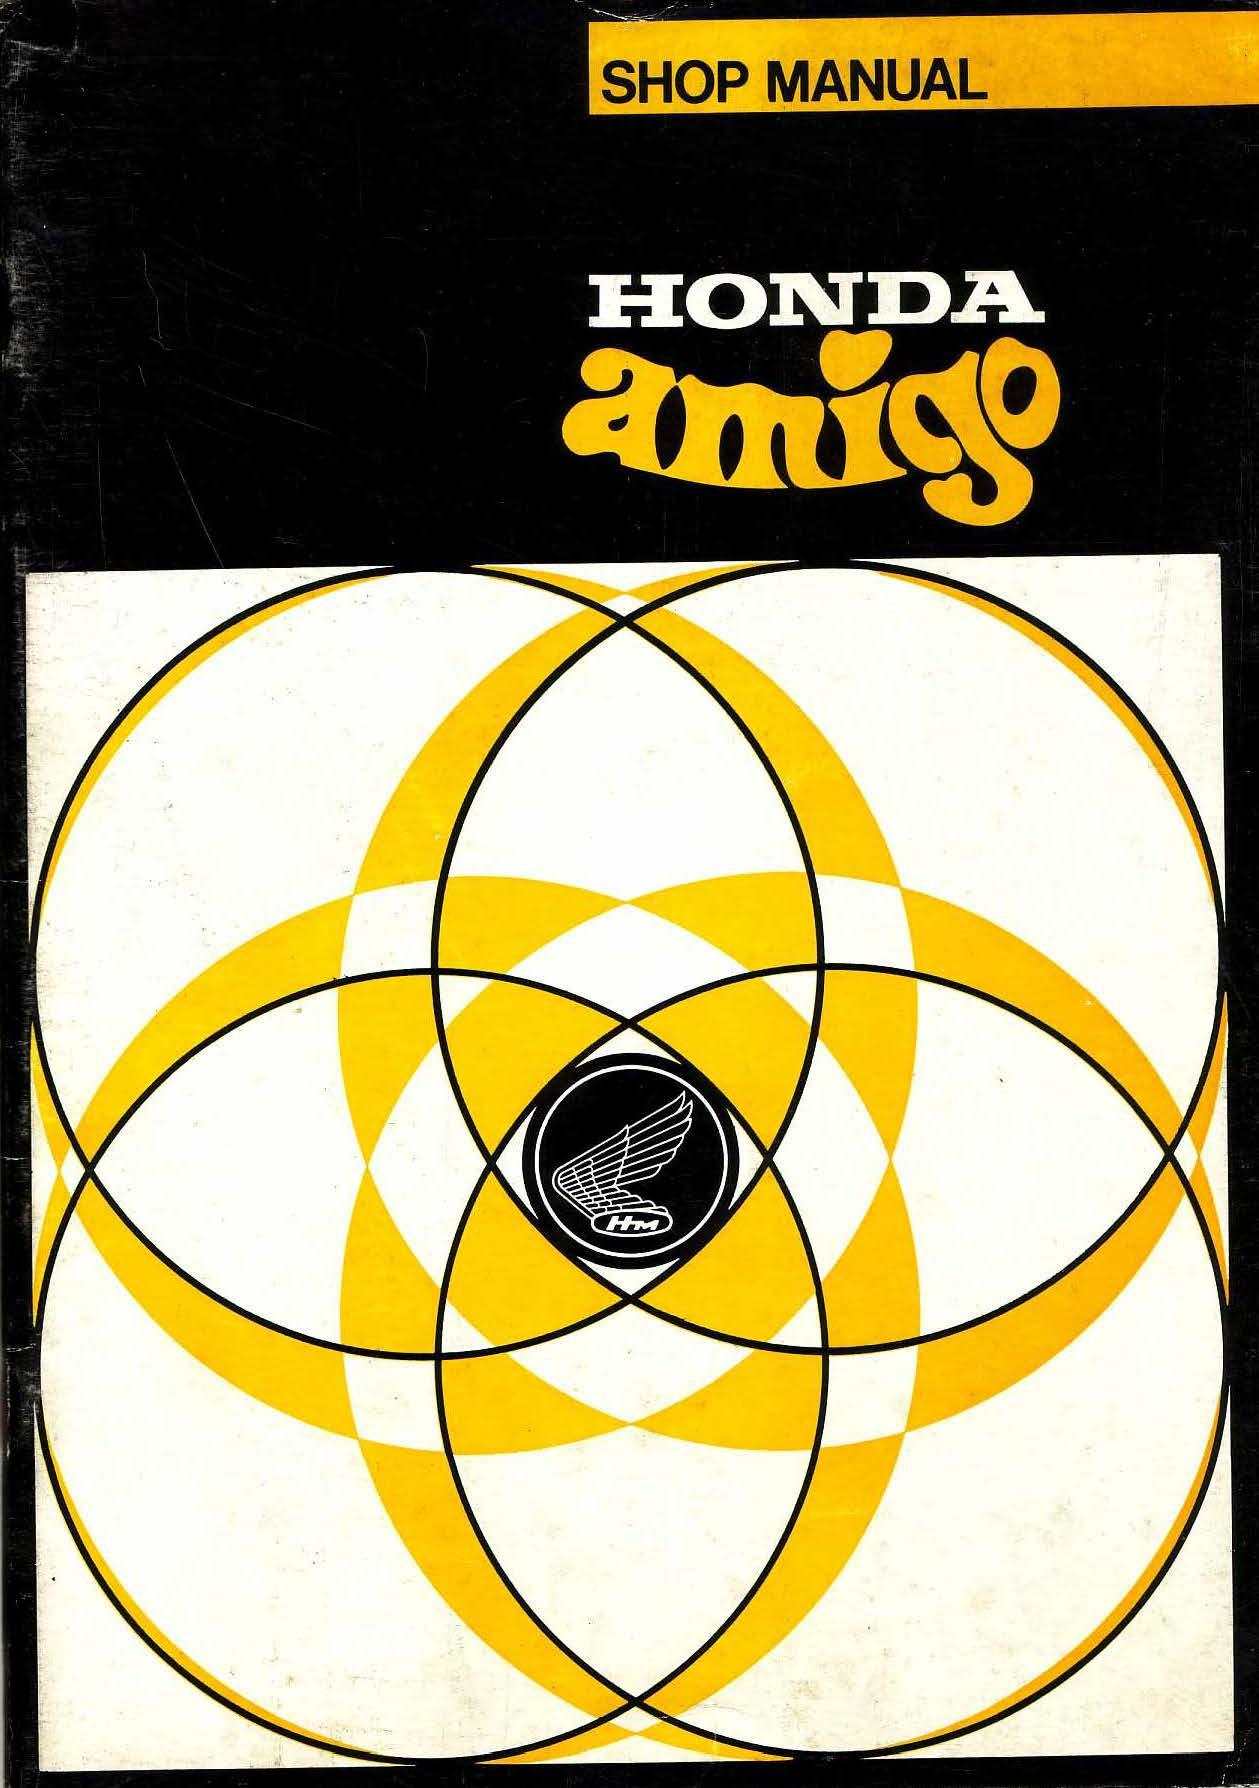 Workshop manual for Honda PF50 Amigo (French)